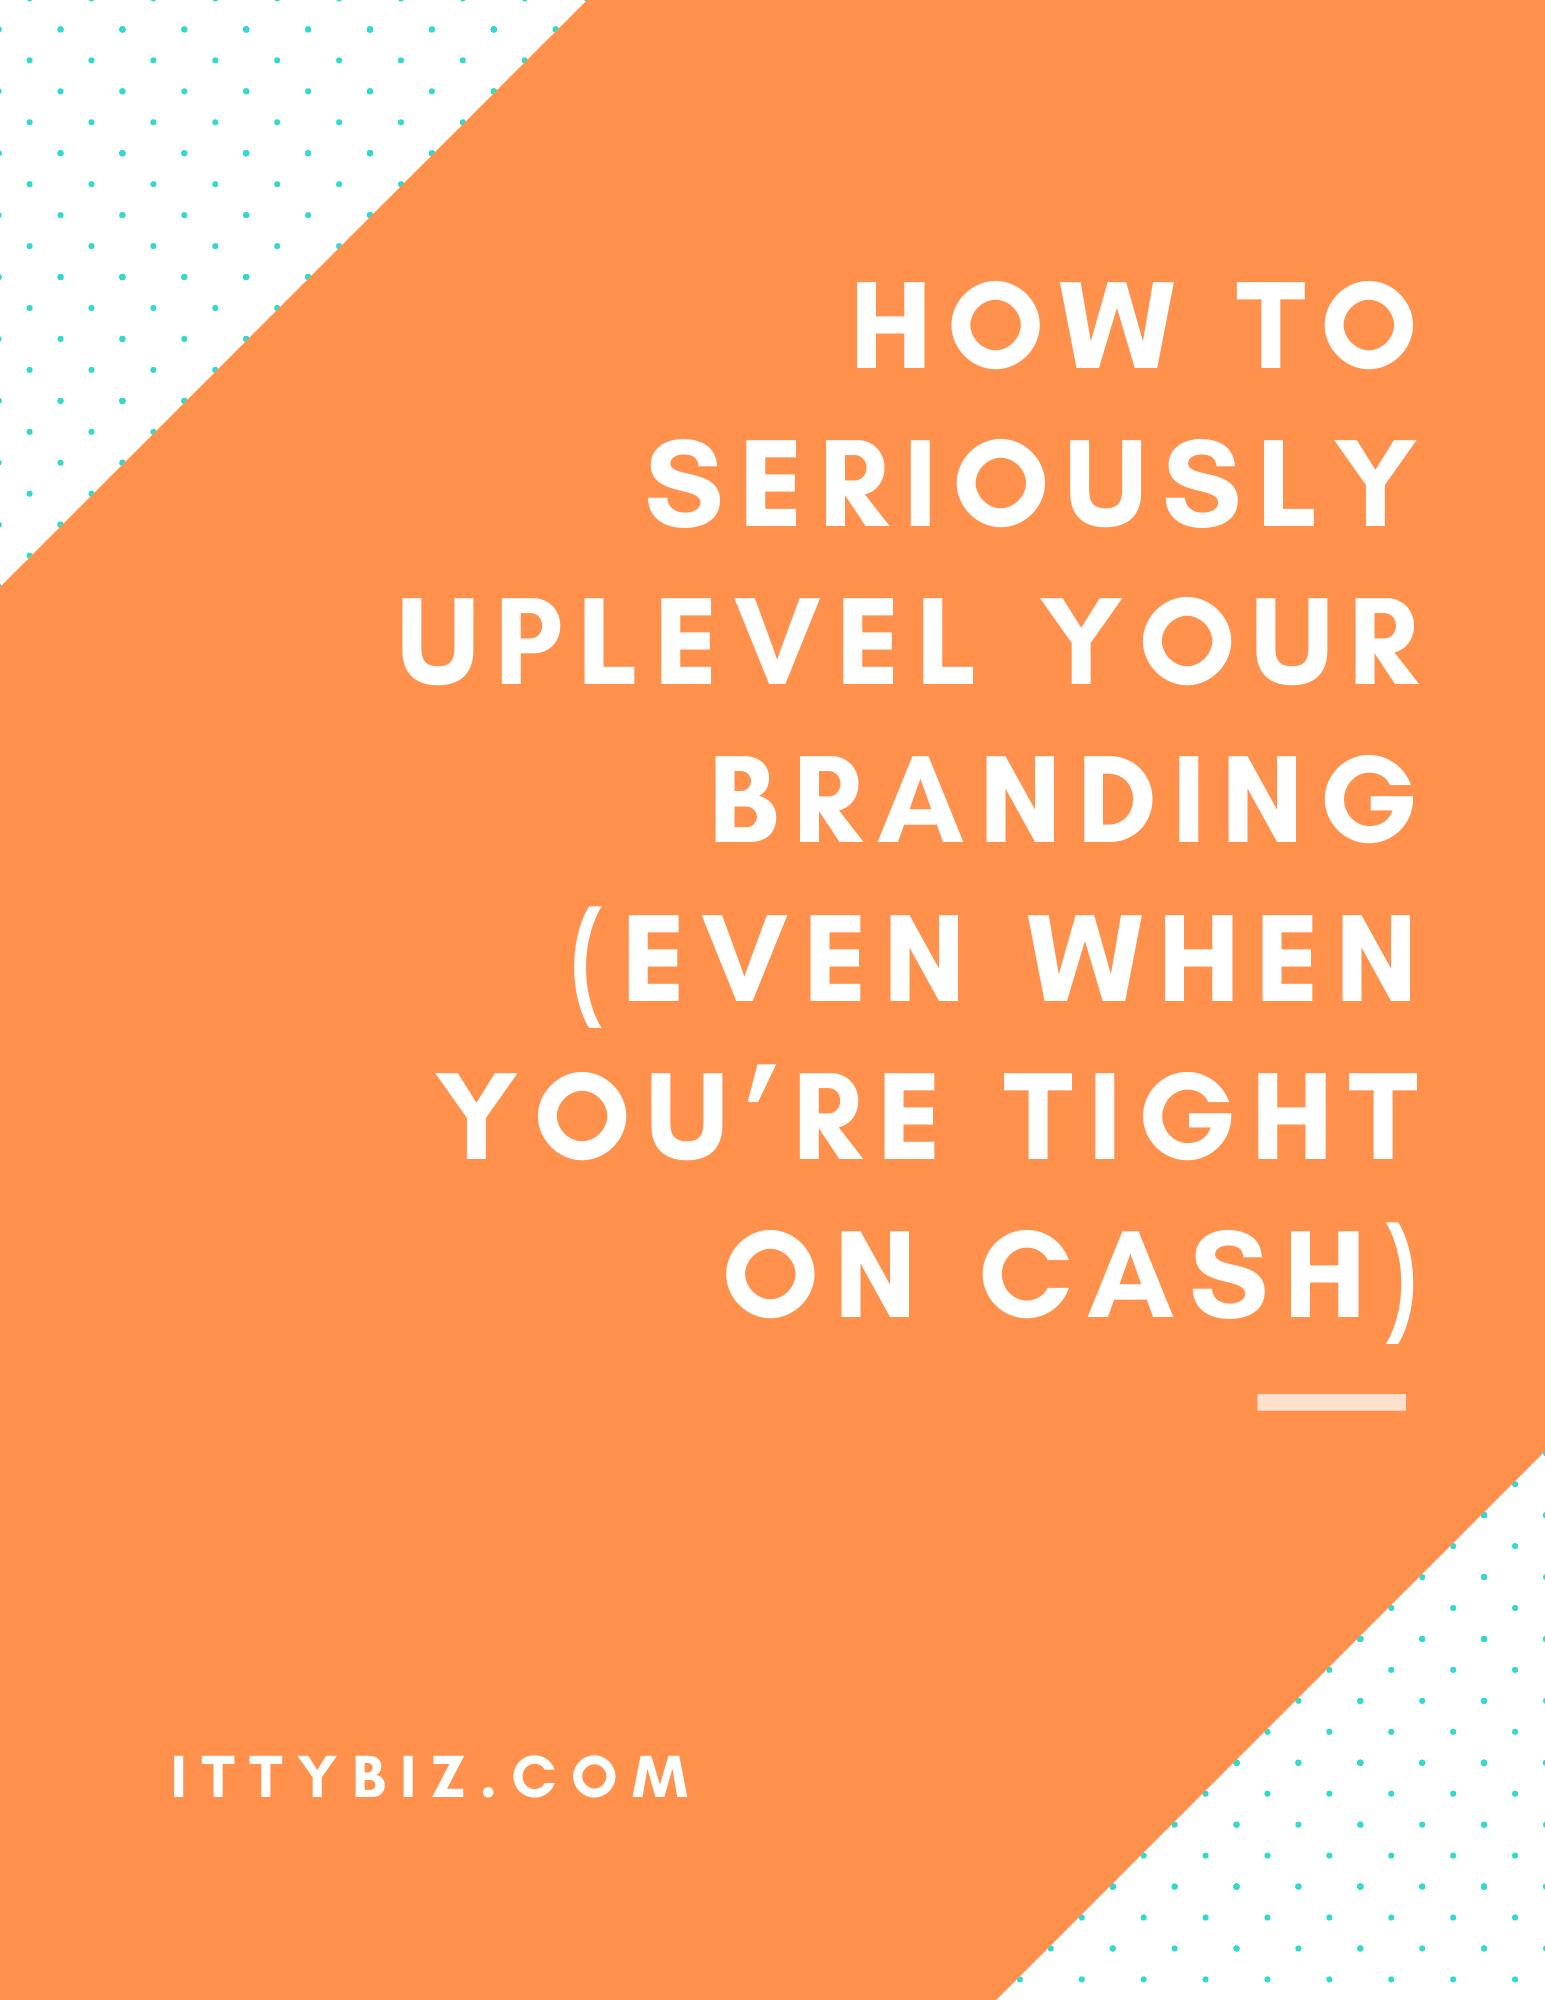 uplevel-your-branding